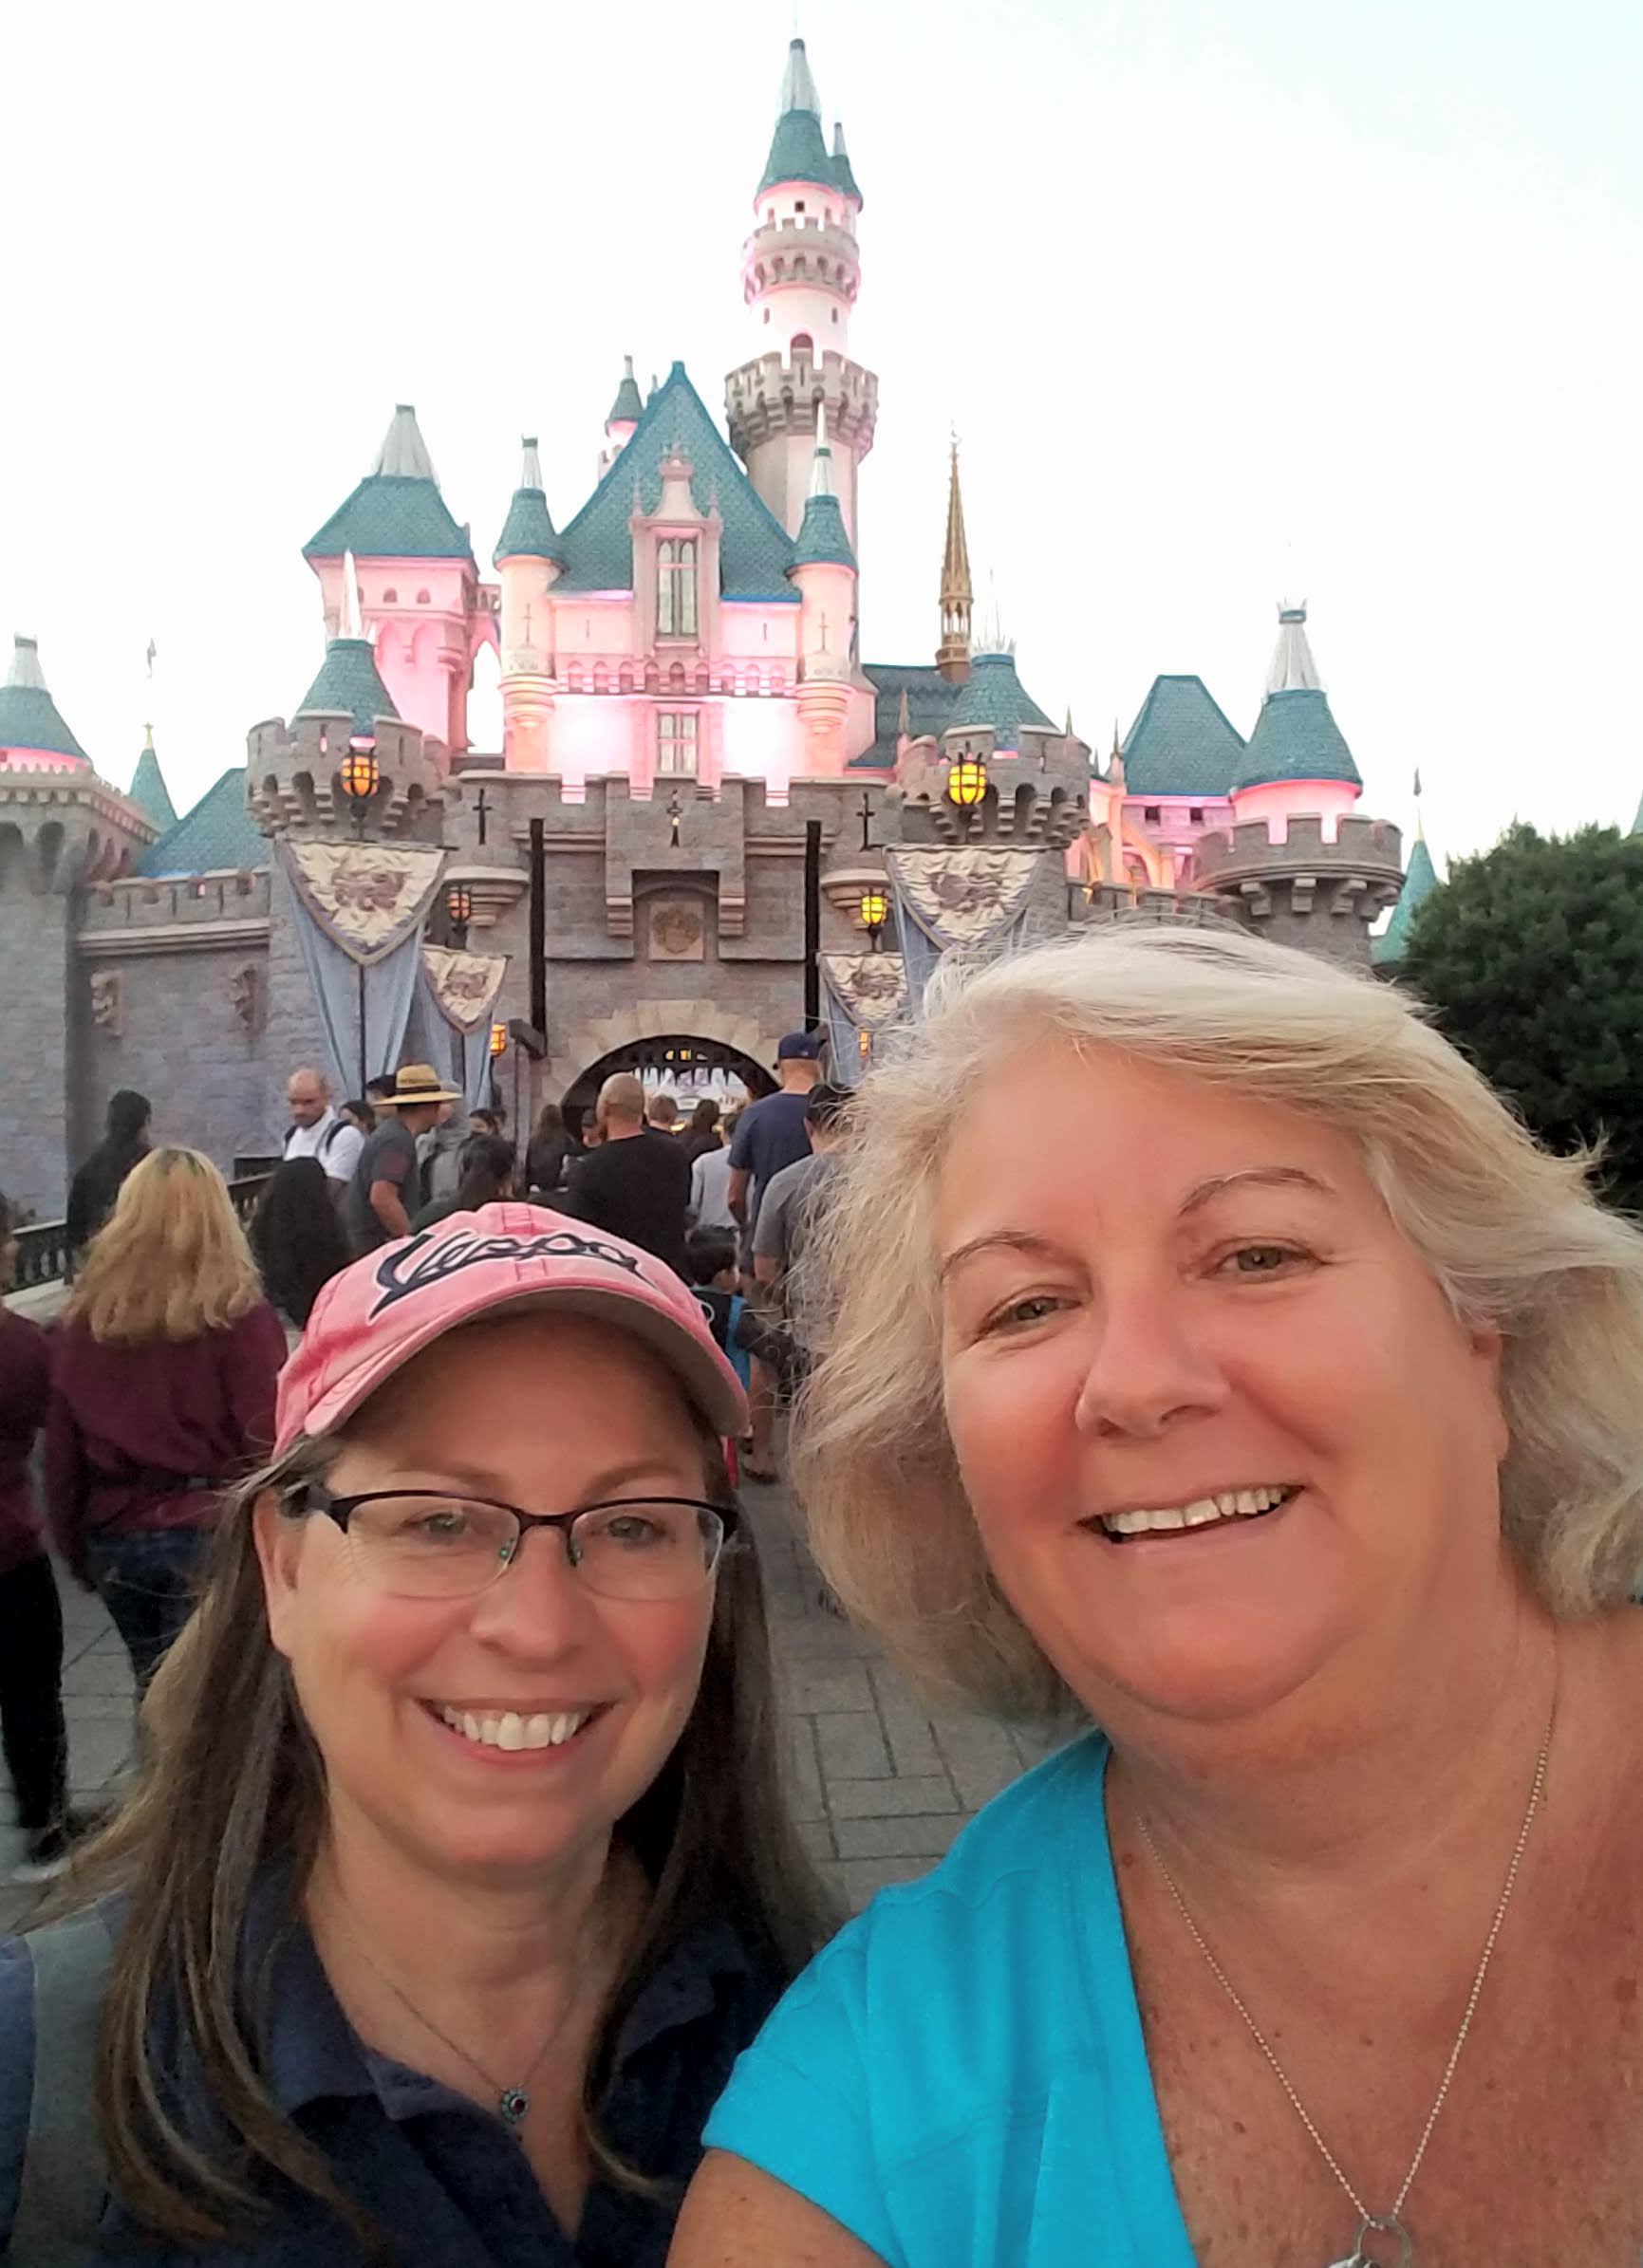 Marcy & Beth visit Disneyland